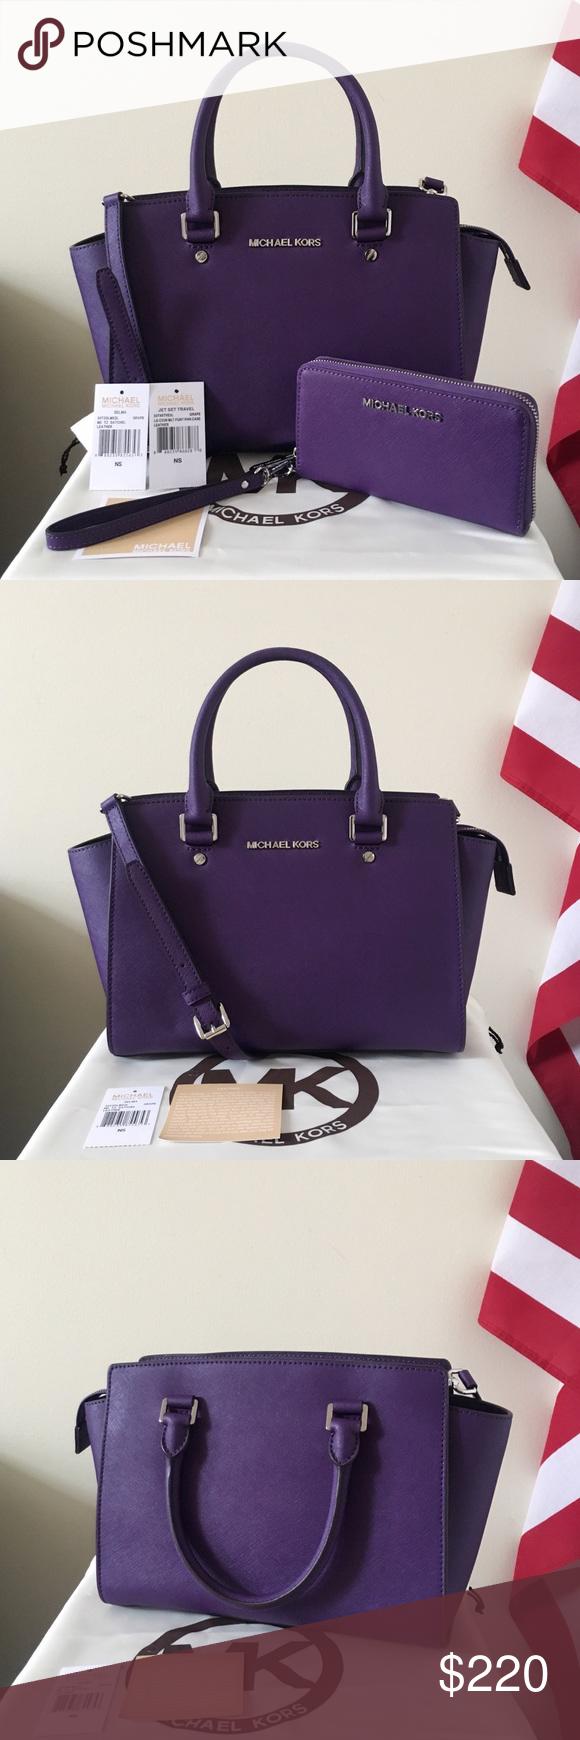 Michael Kors Selma Satchel Medium Set Beautiful And Elegant Lilac Authentic Purple Saffiano Leather With Silver